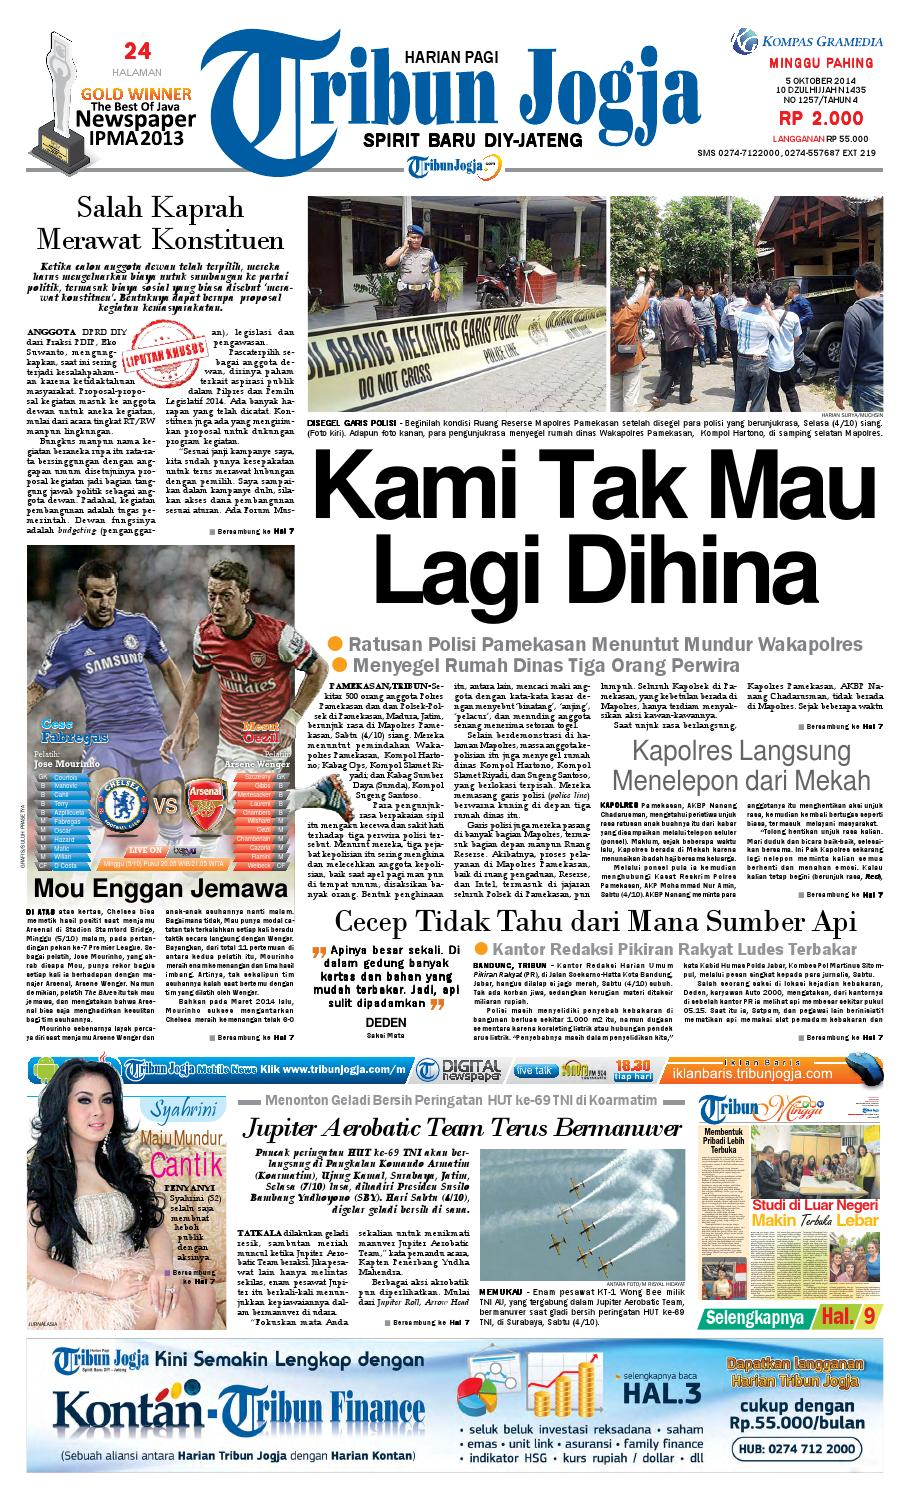 Tribunjogja 05 10 2014 By Tribun Jogja Issuu Loop Hardiknas Voucher Indomaret Rp 200000